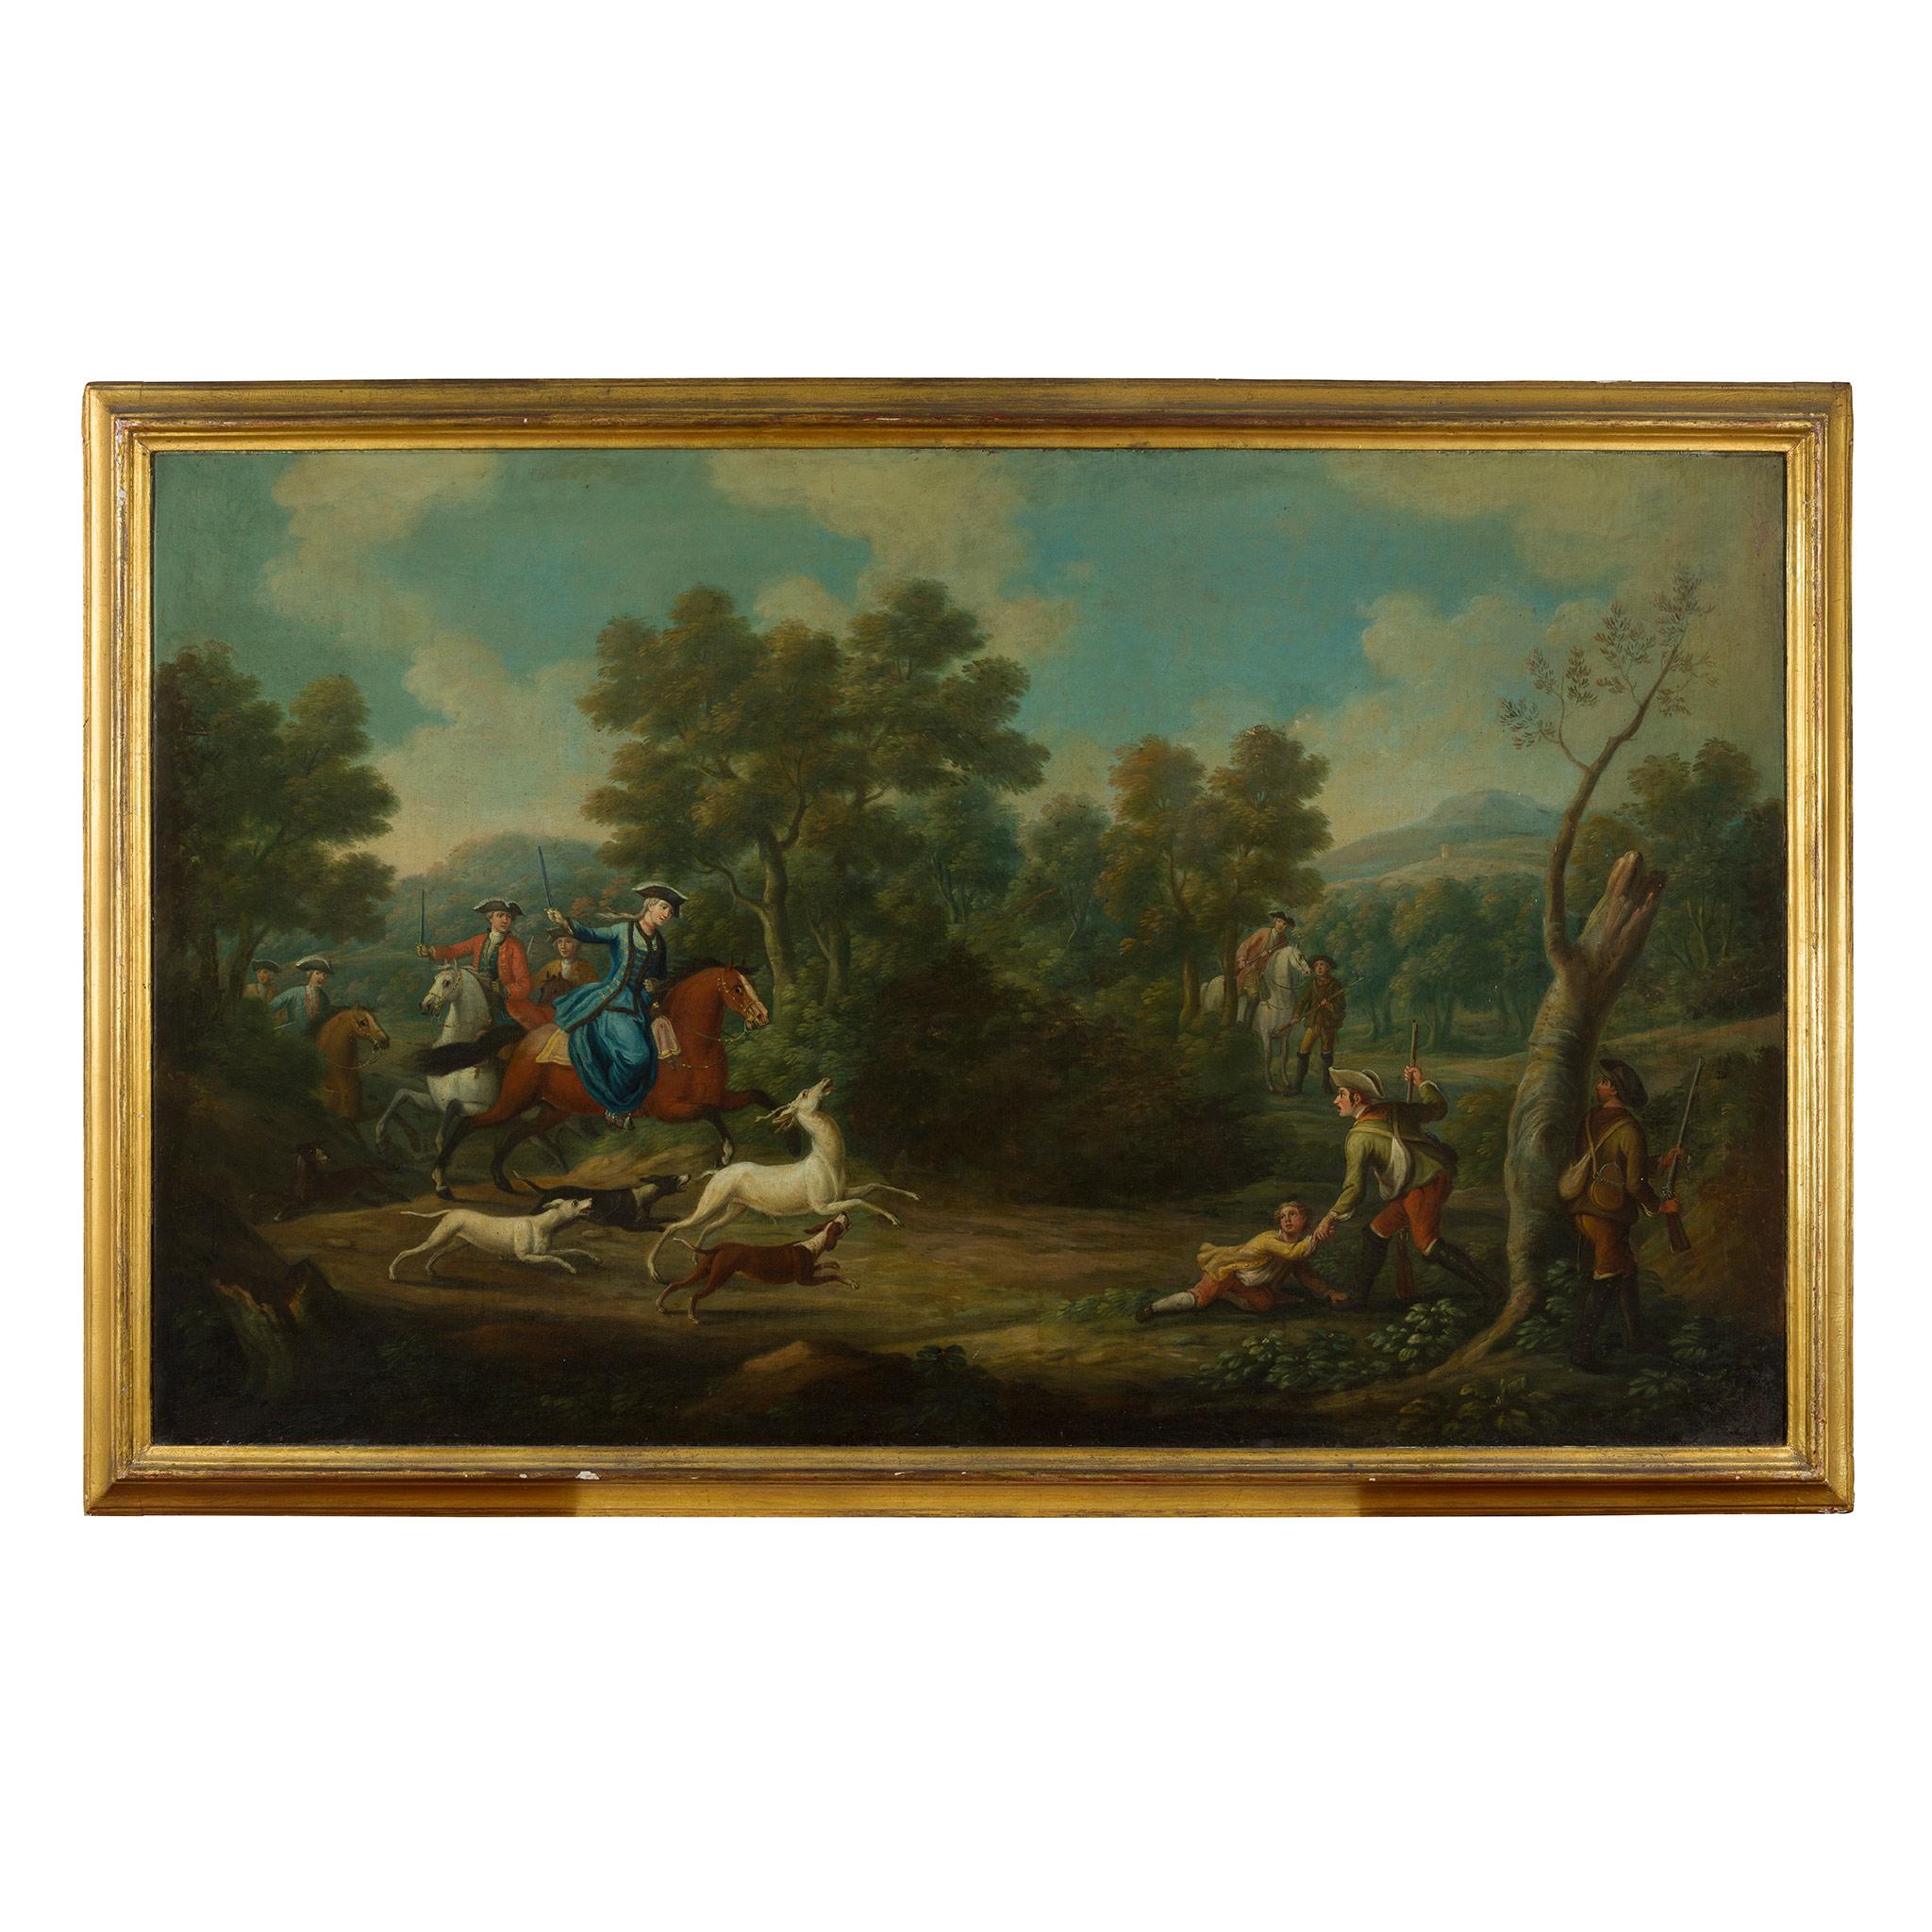 18TH CENTURY FRENCH SCHOOL ELEGANT FIGURES BOAR HUNTING - Image 7 of 8